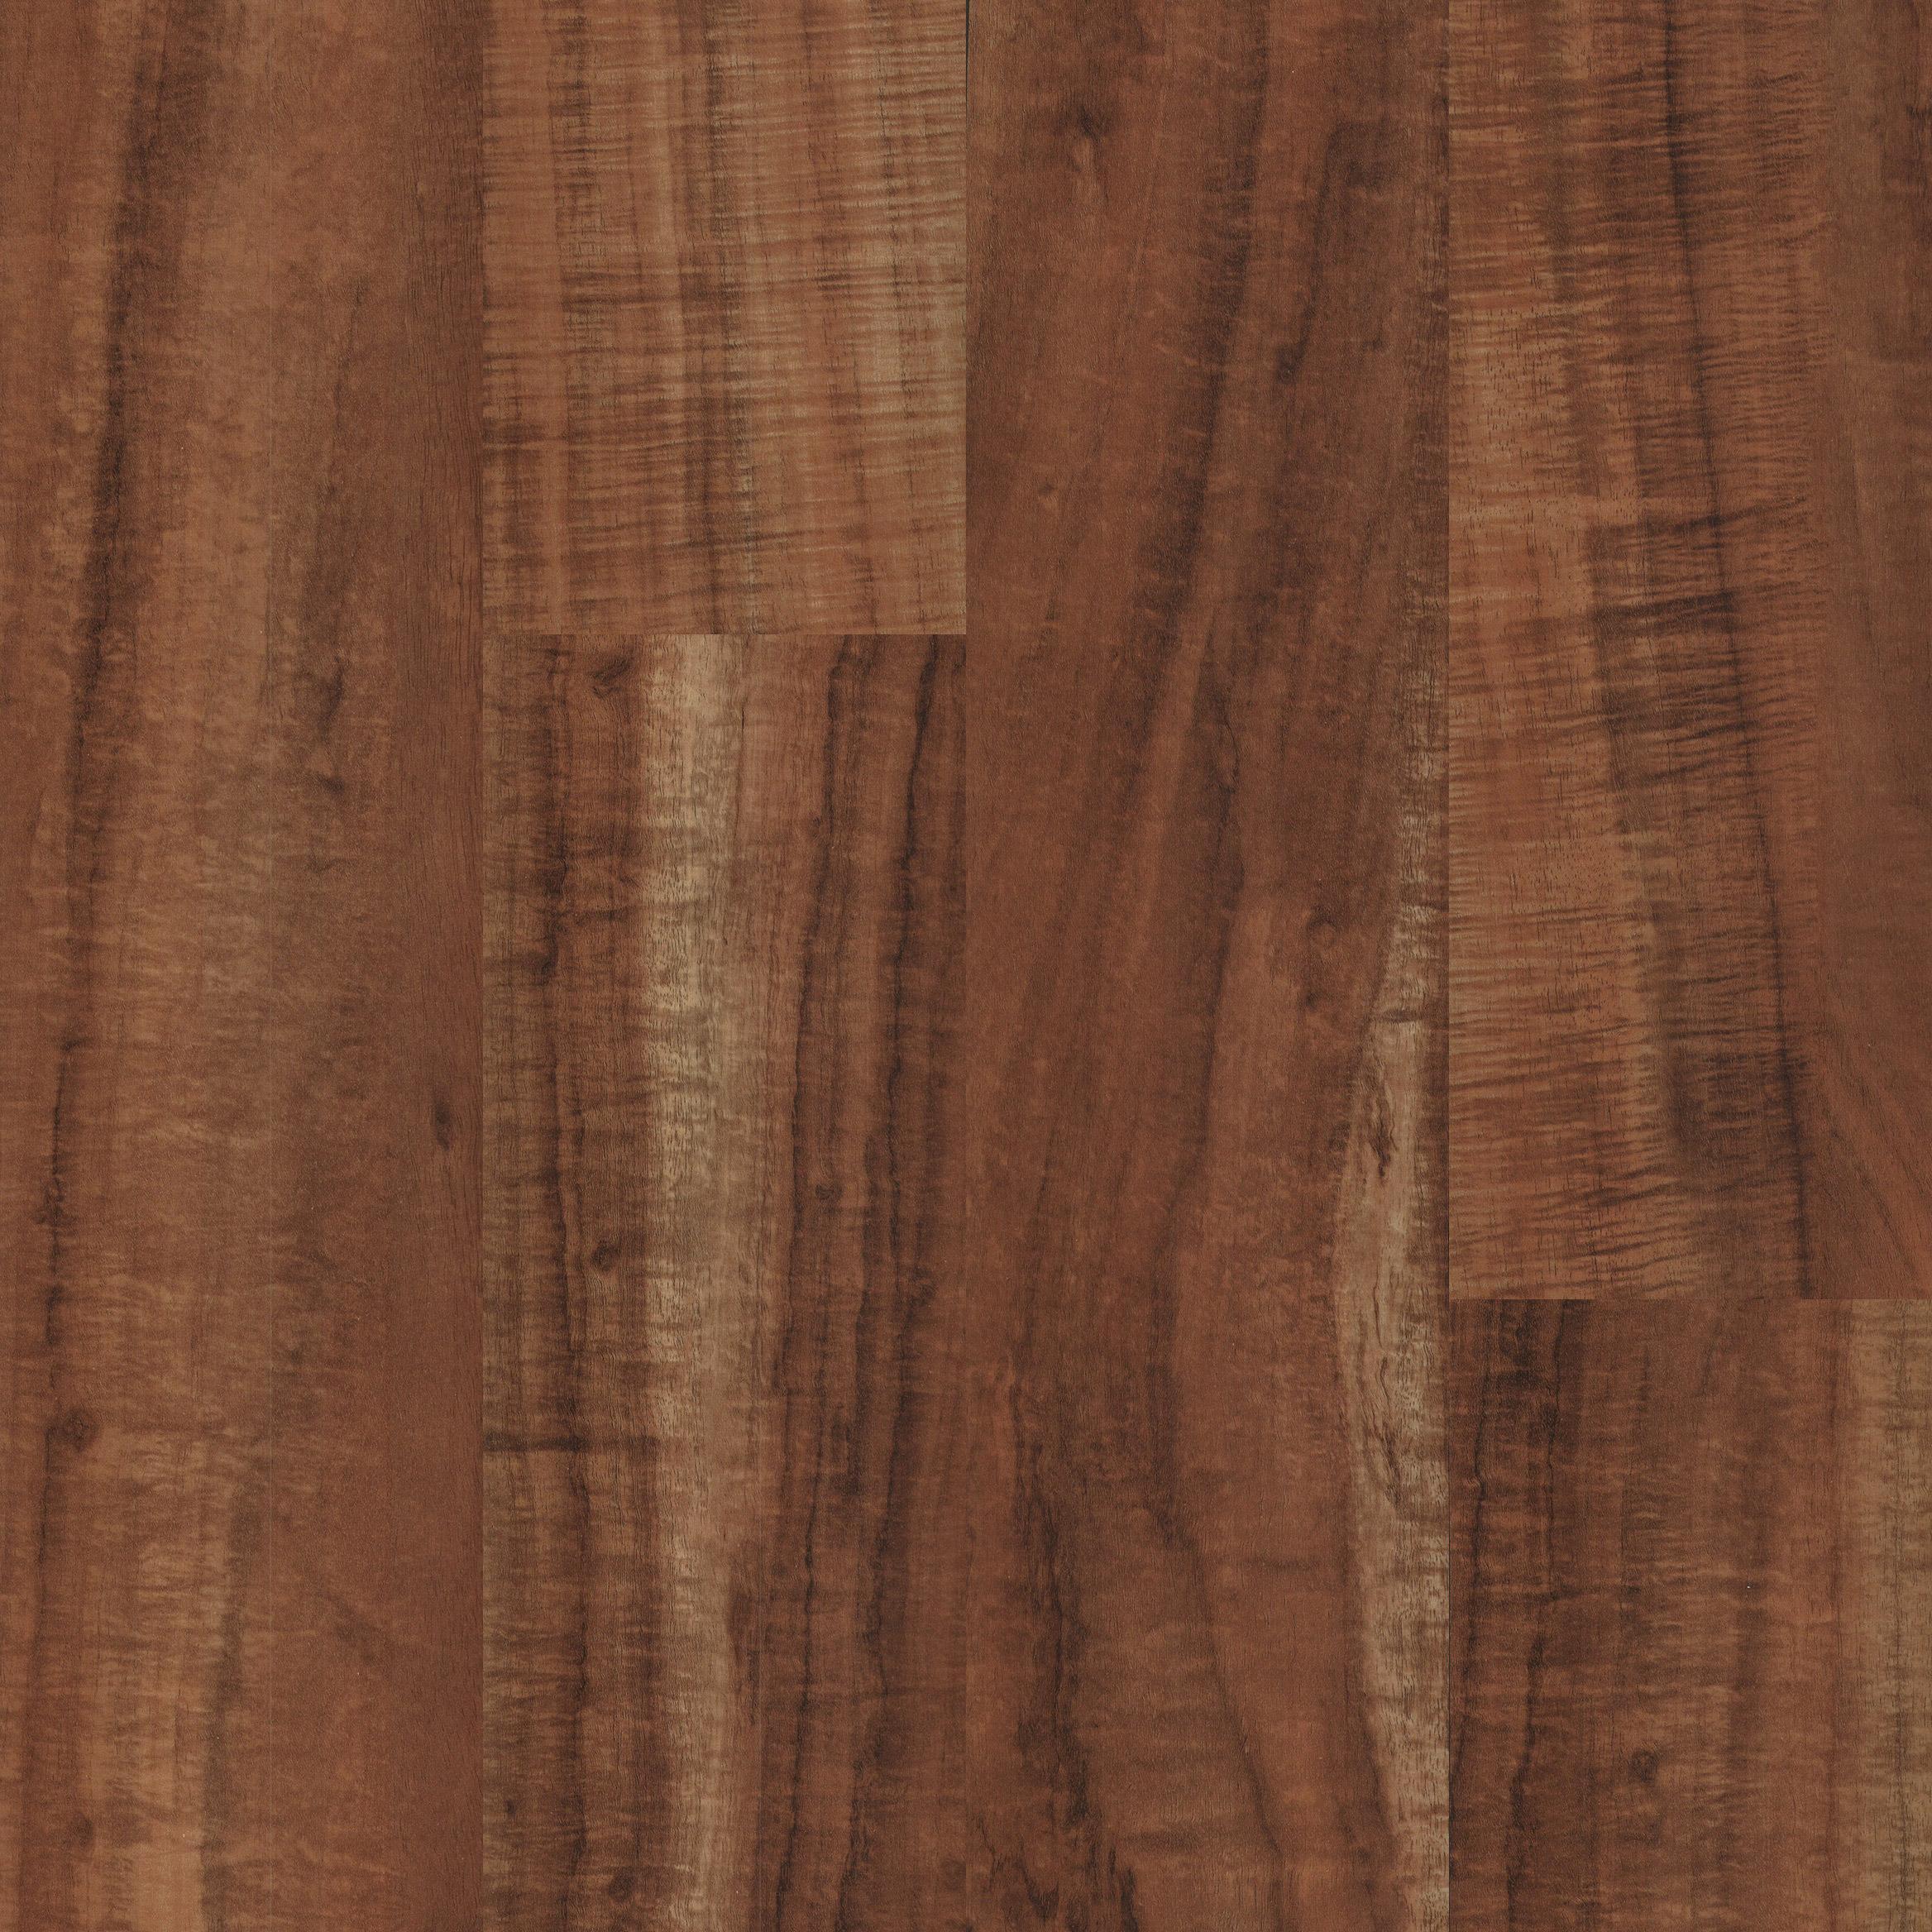 vinyl vs hardwood flooring cost of ivc moduleo horizon serengeti cherry 6 wide waterproof click with ivc moduleo horizon serengeti cherry 6 wide waterproof click together lvt vinyl plank flooring